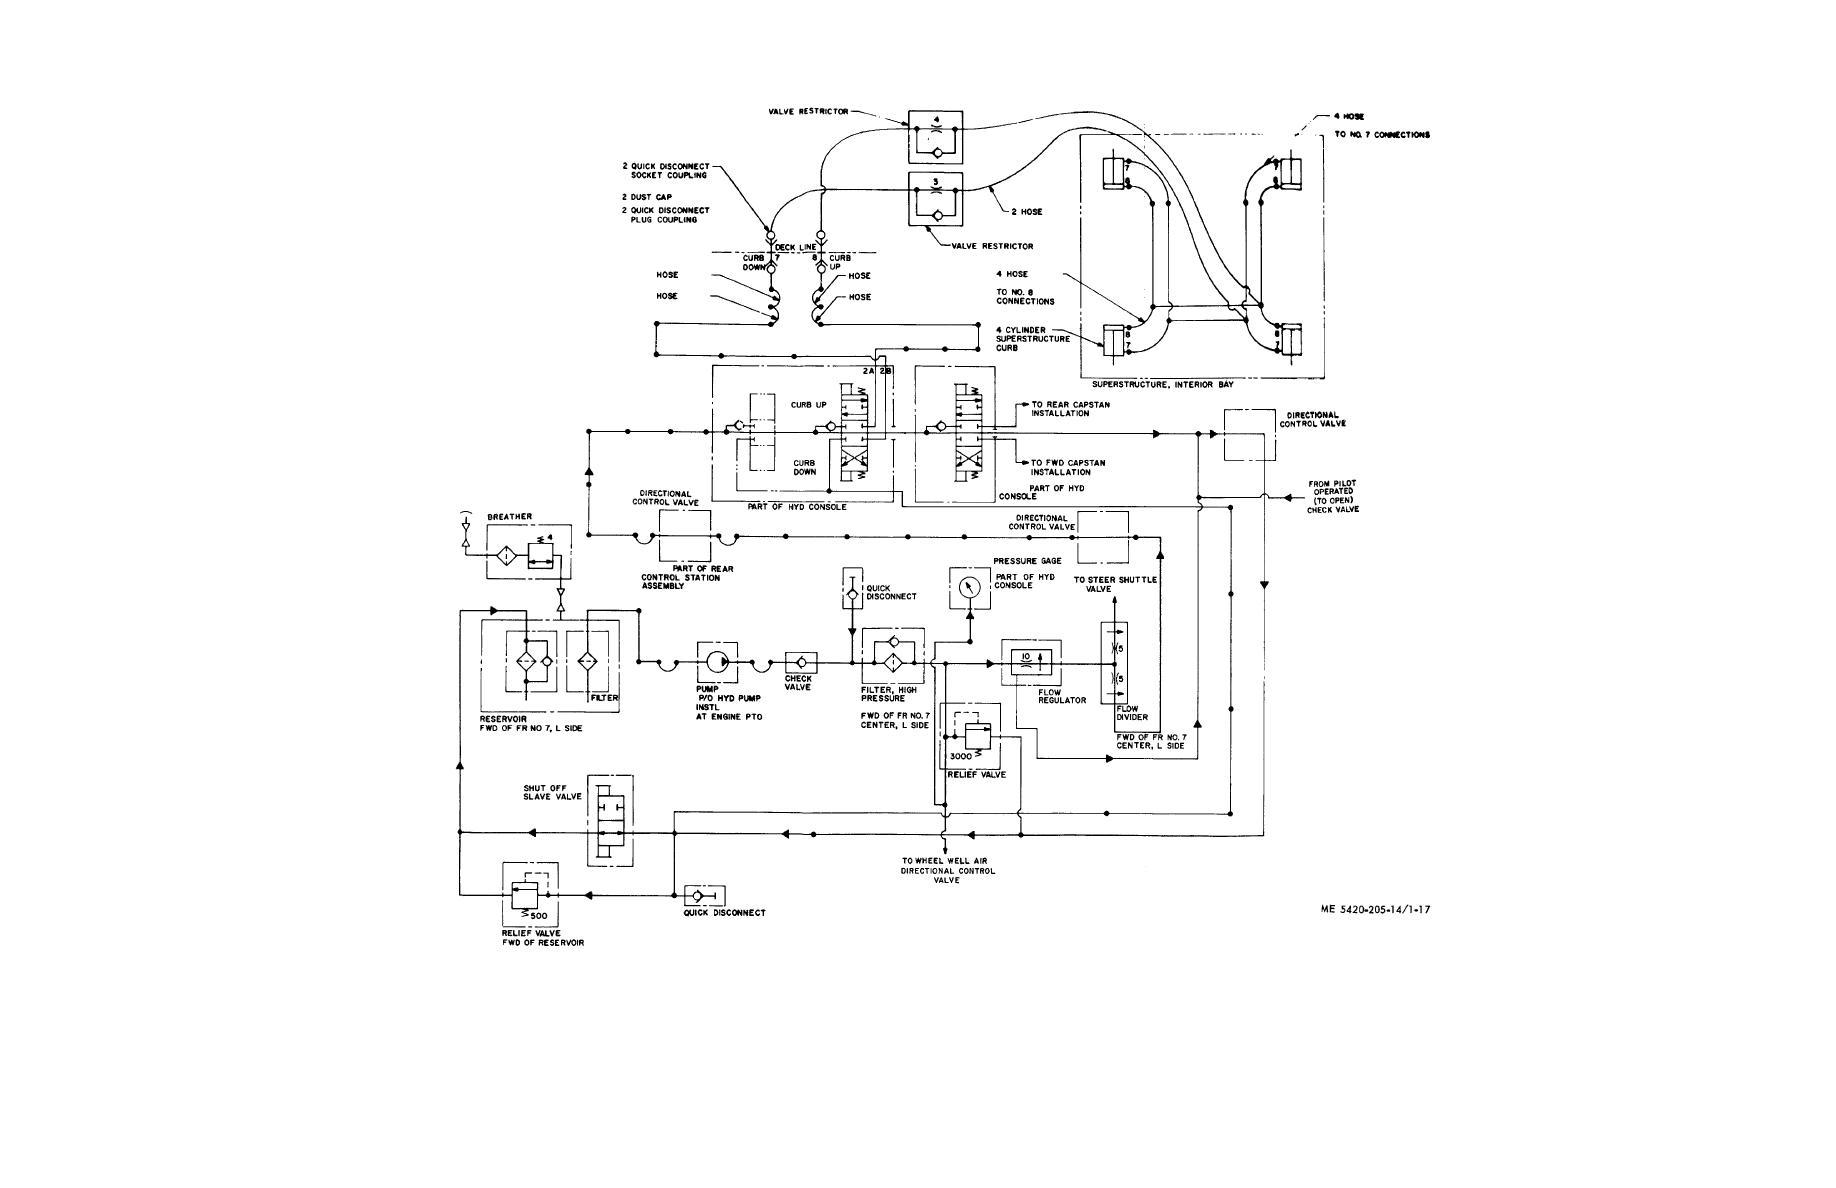 draftingmanuals tpub   14040 img 14040 159 1 further Plumbing Valve Symbols as well Relay logic besides Plumbing Problems Clog additionally Dodge Van Repair. on hvac schematic symbols chart